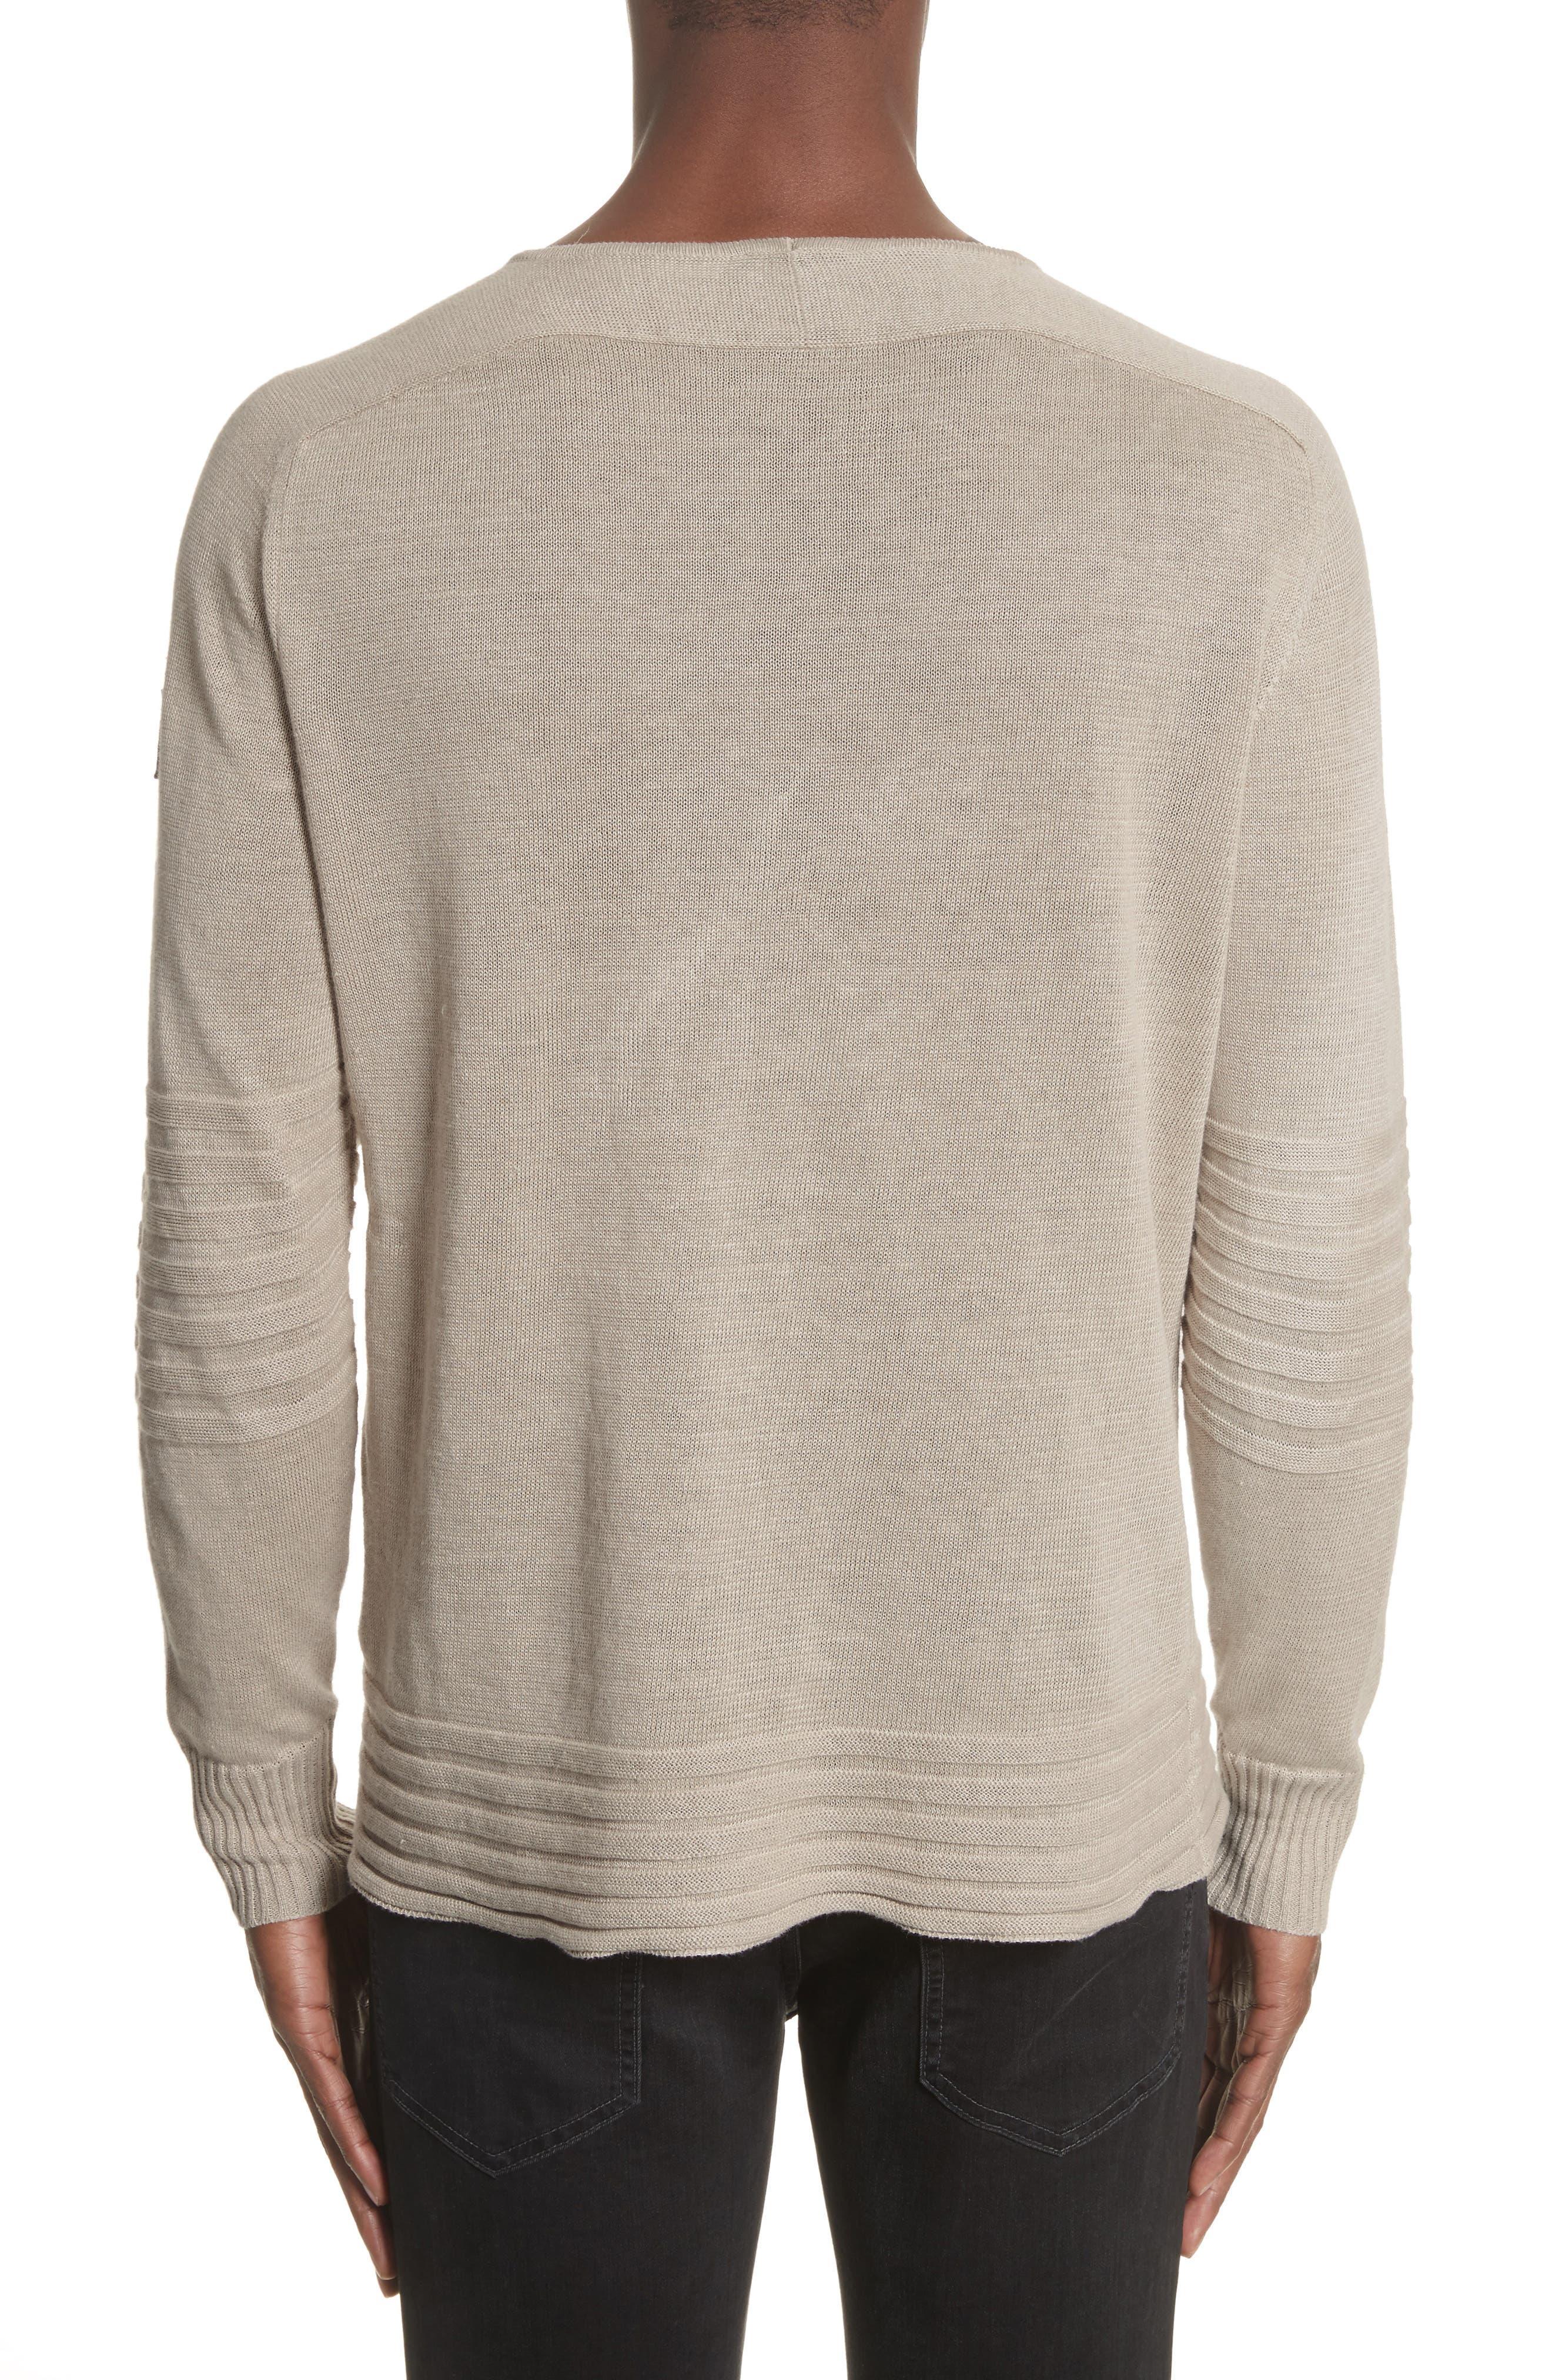 Exford Linen Crewneck Sweater,                             Alternate thumbnail 2, color,                             270